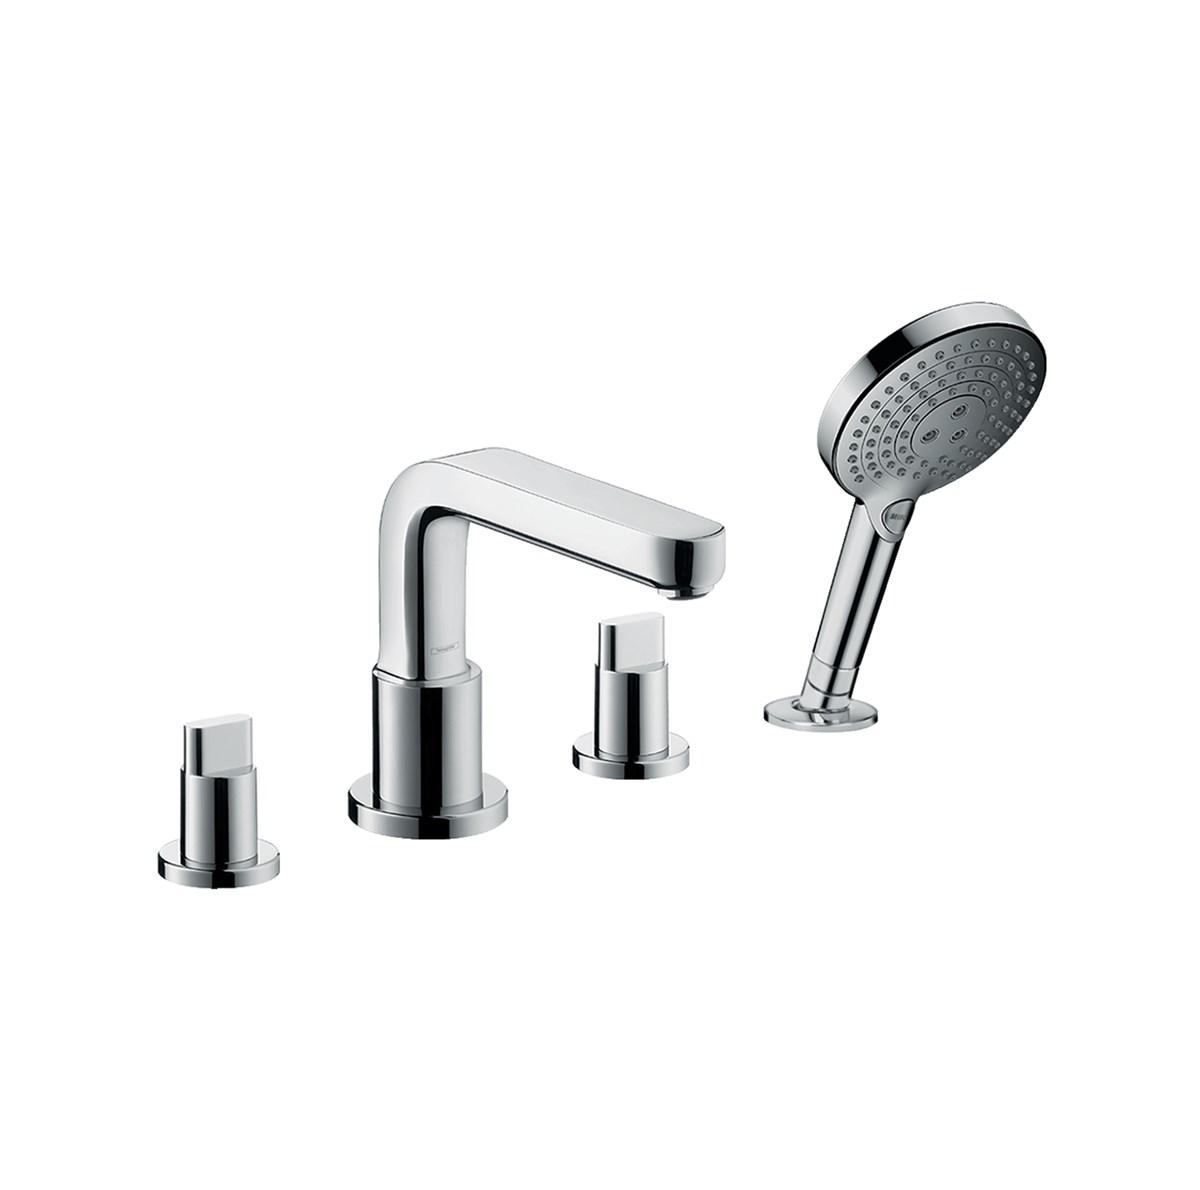 Hansgrohe-Metris-S-4-hole-Bath-Mixer-31443000-Matisse-1